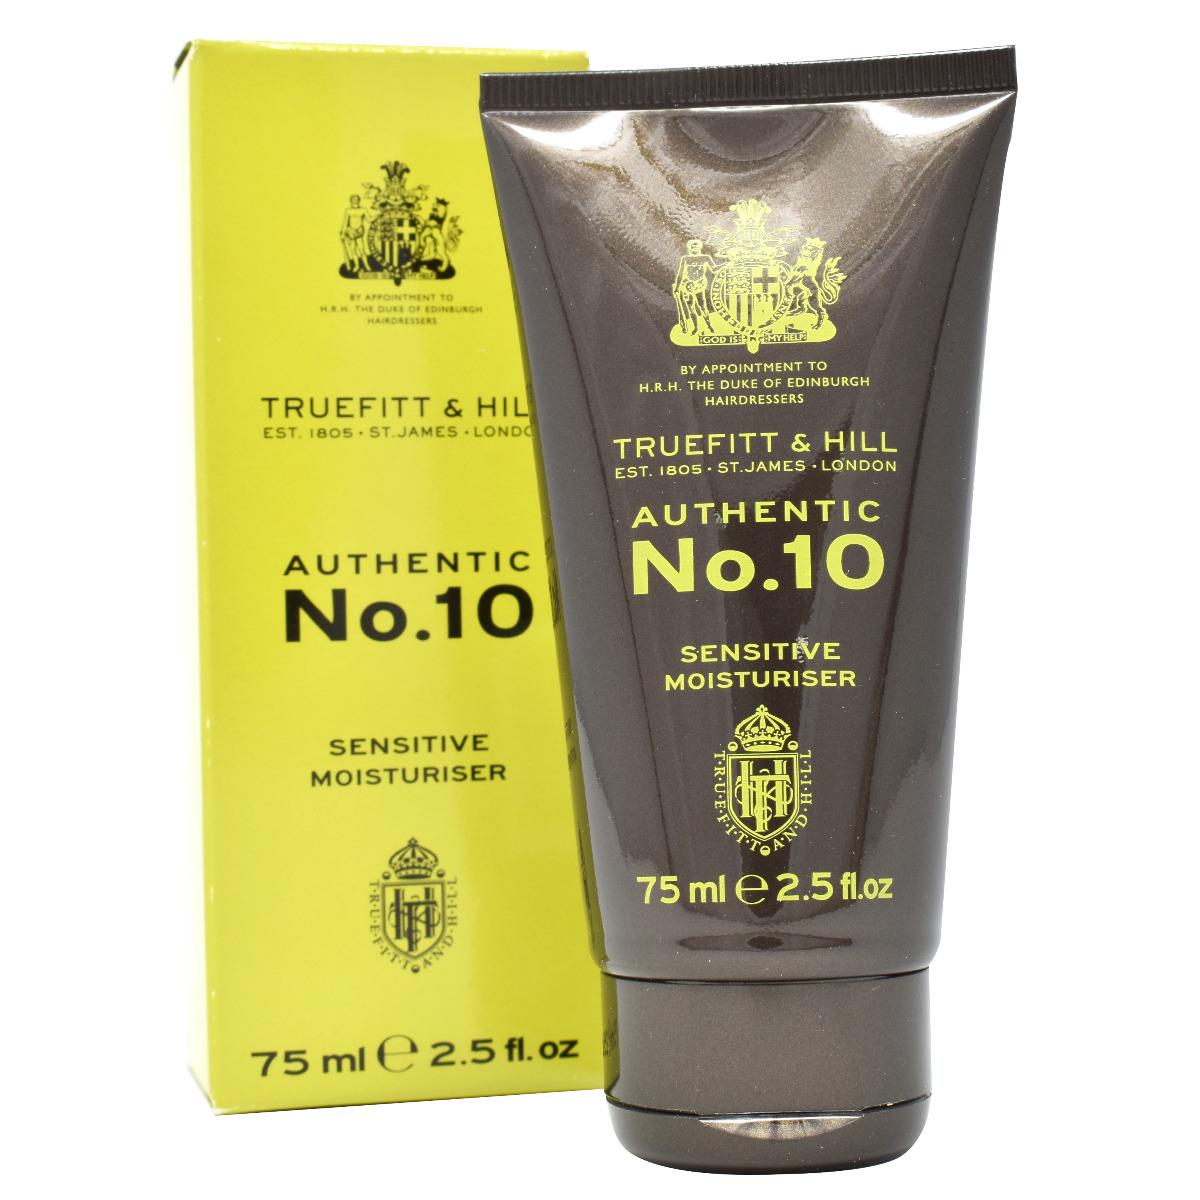 Truefitt and Hill No.10 Sensitive Skin Moisturiser 75ml